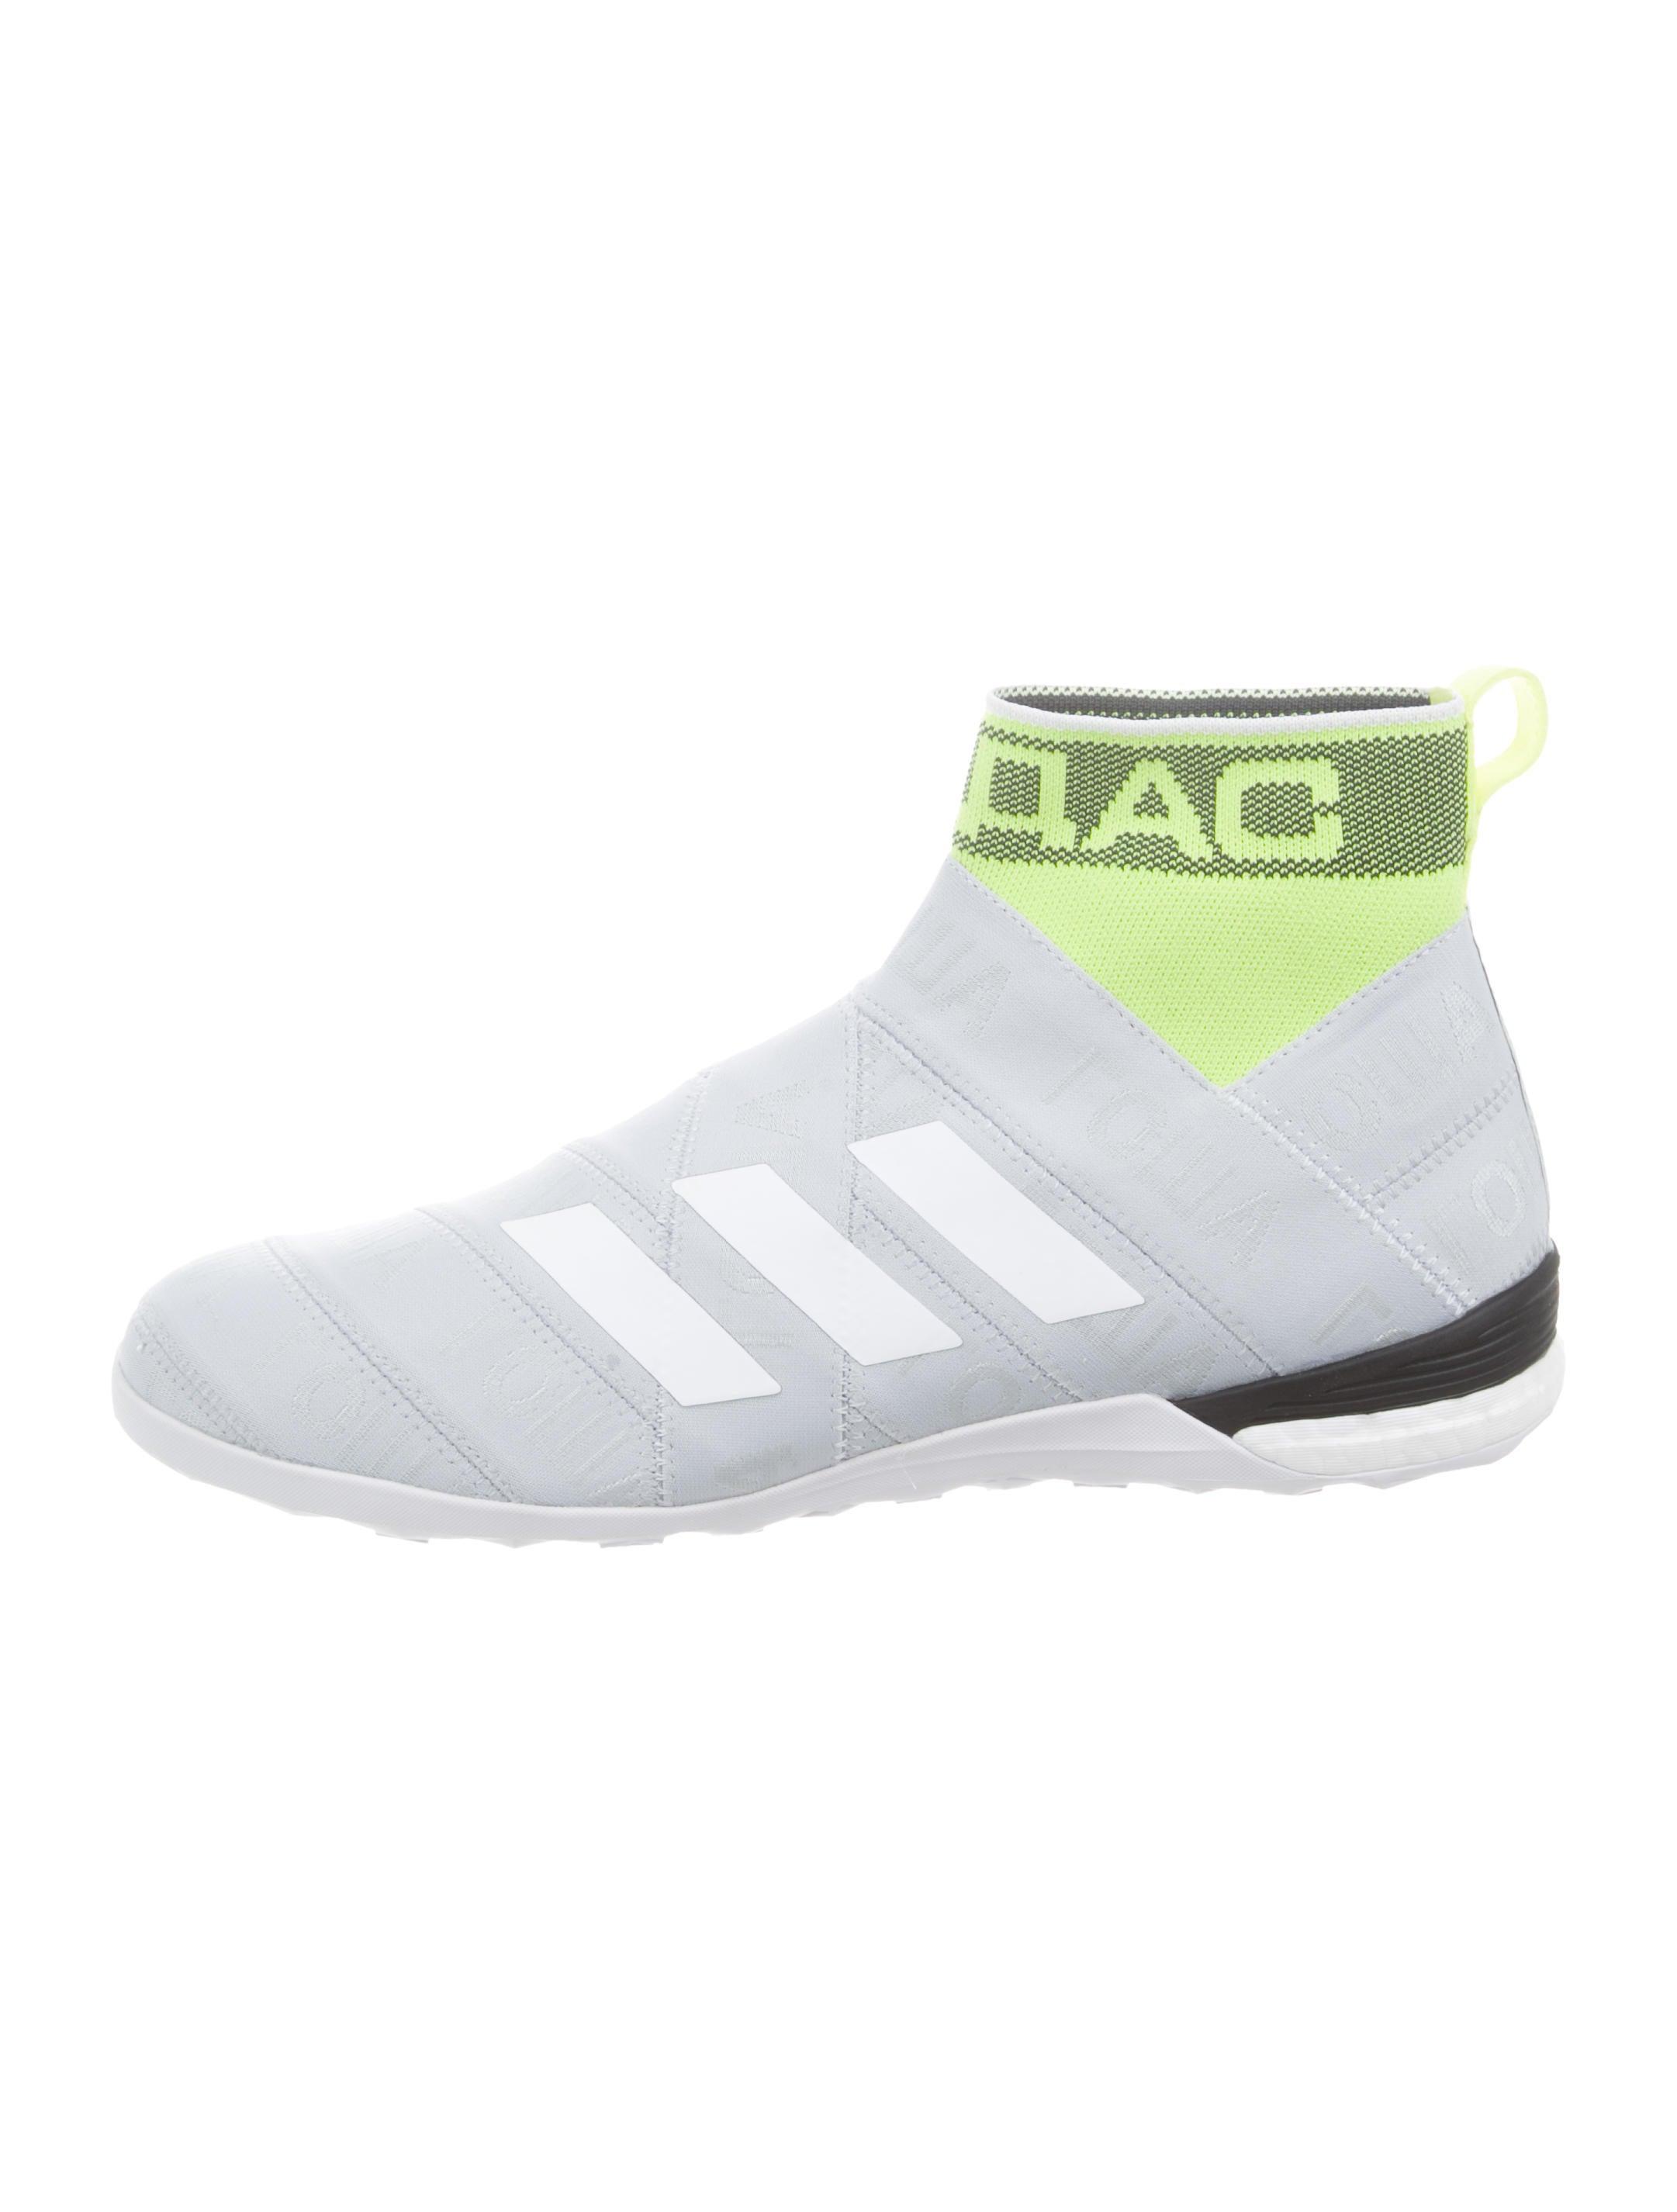 89eed4278a19 Gosha Rubchinskiy x adidas GR Nemeziz Mid Sneakers w  Tags - Shoes -  WADGR20181